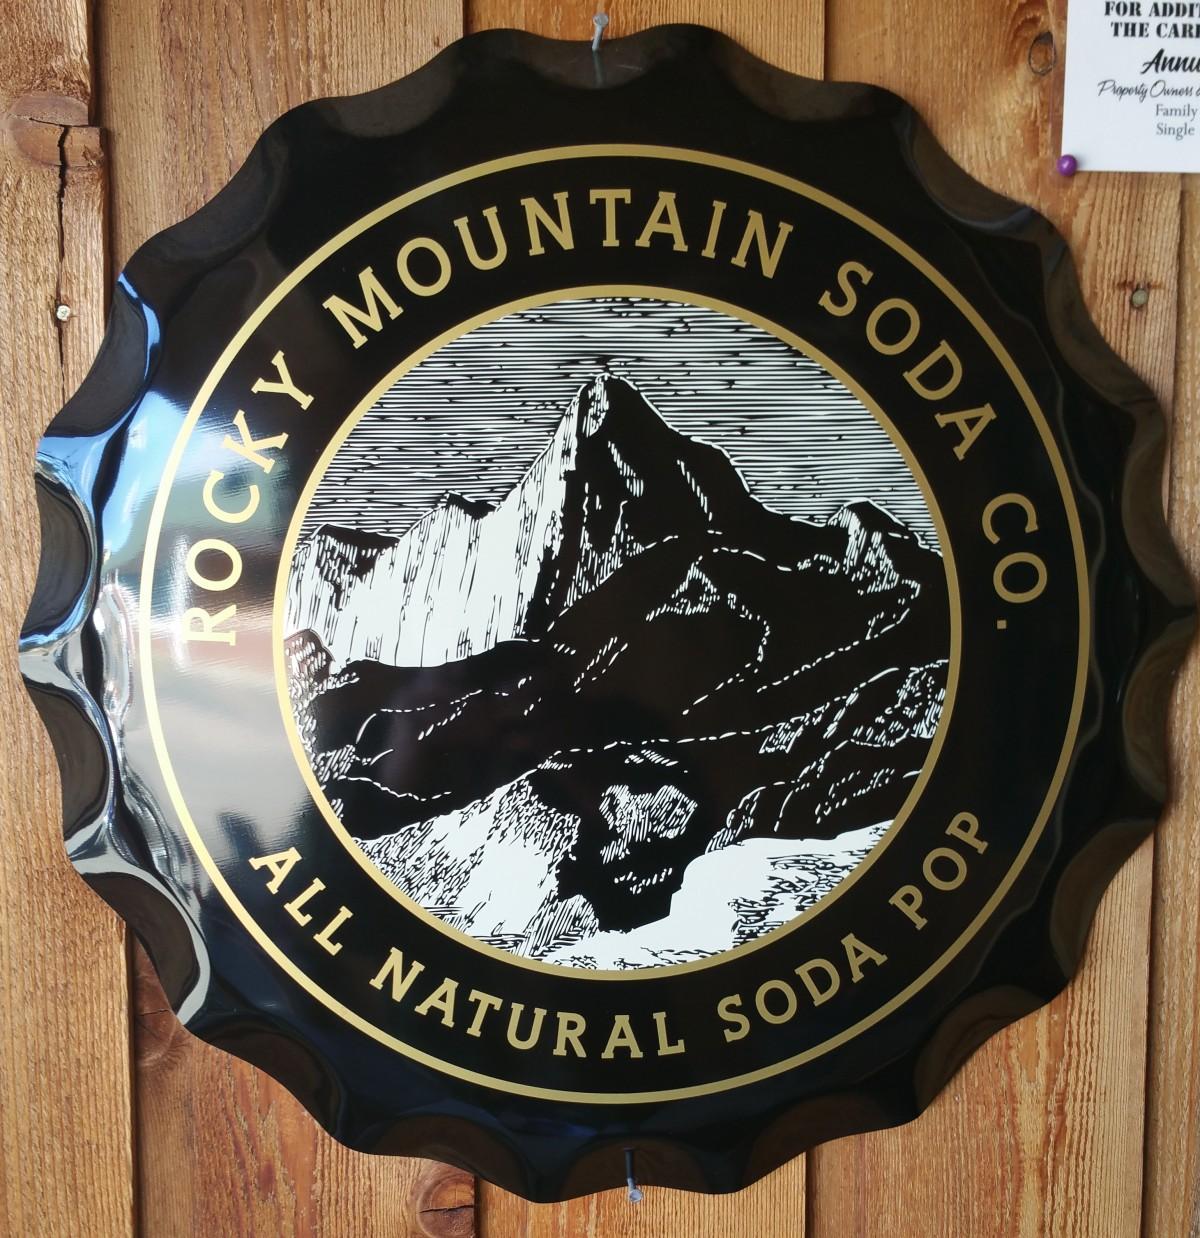 Rocky Mountain Soda